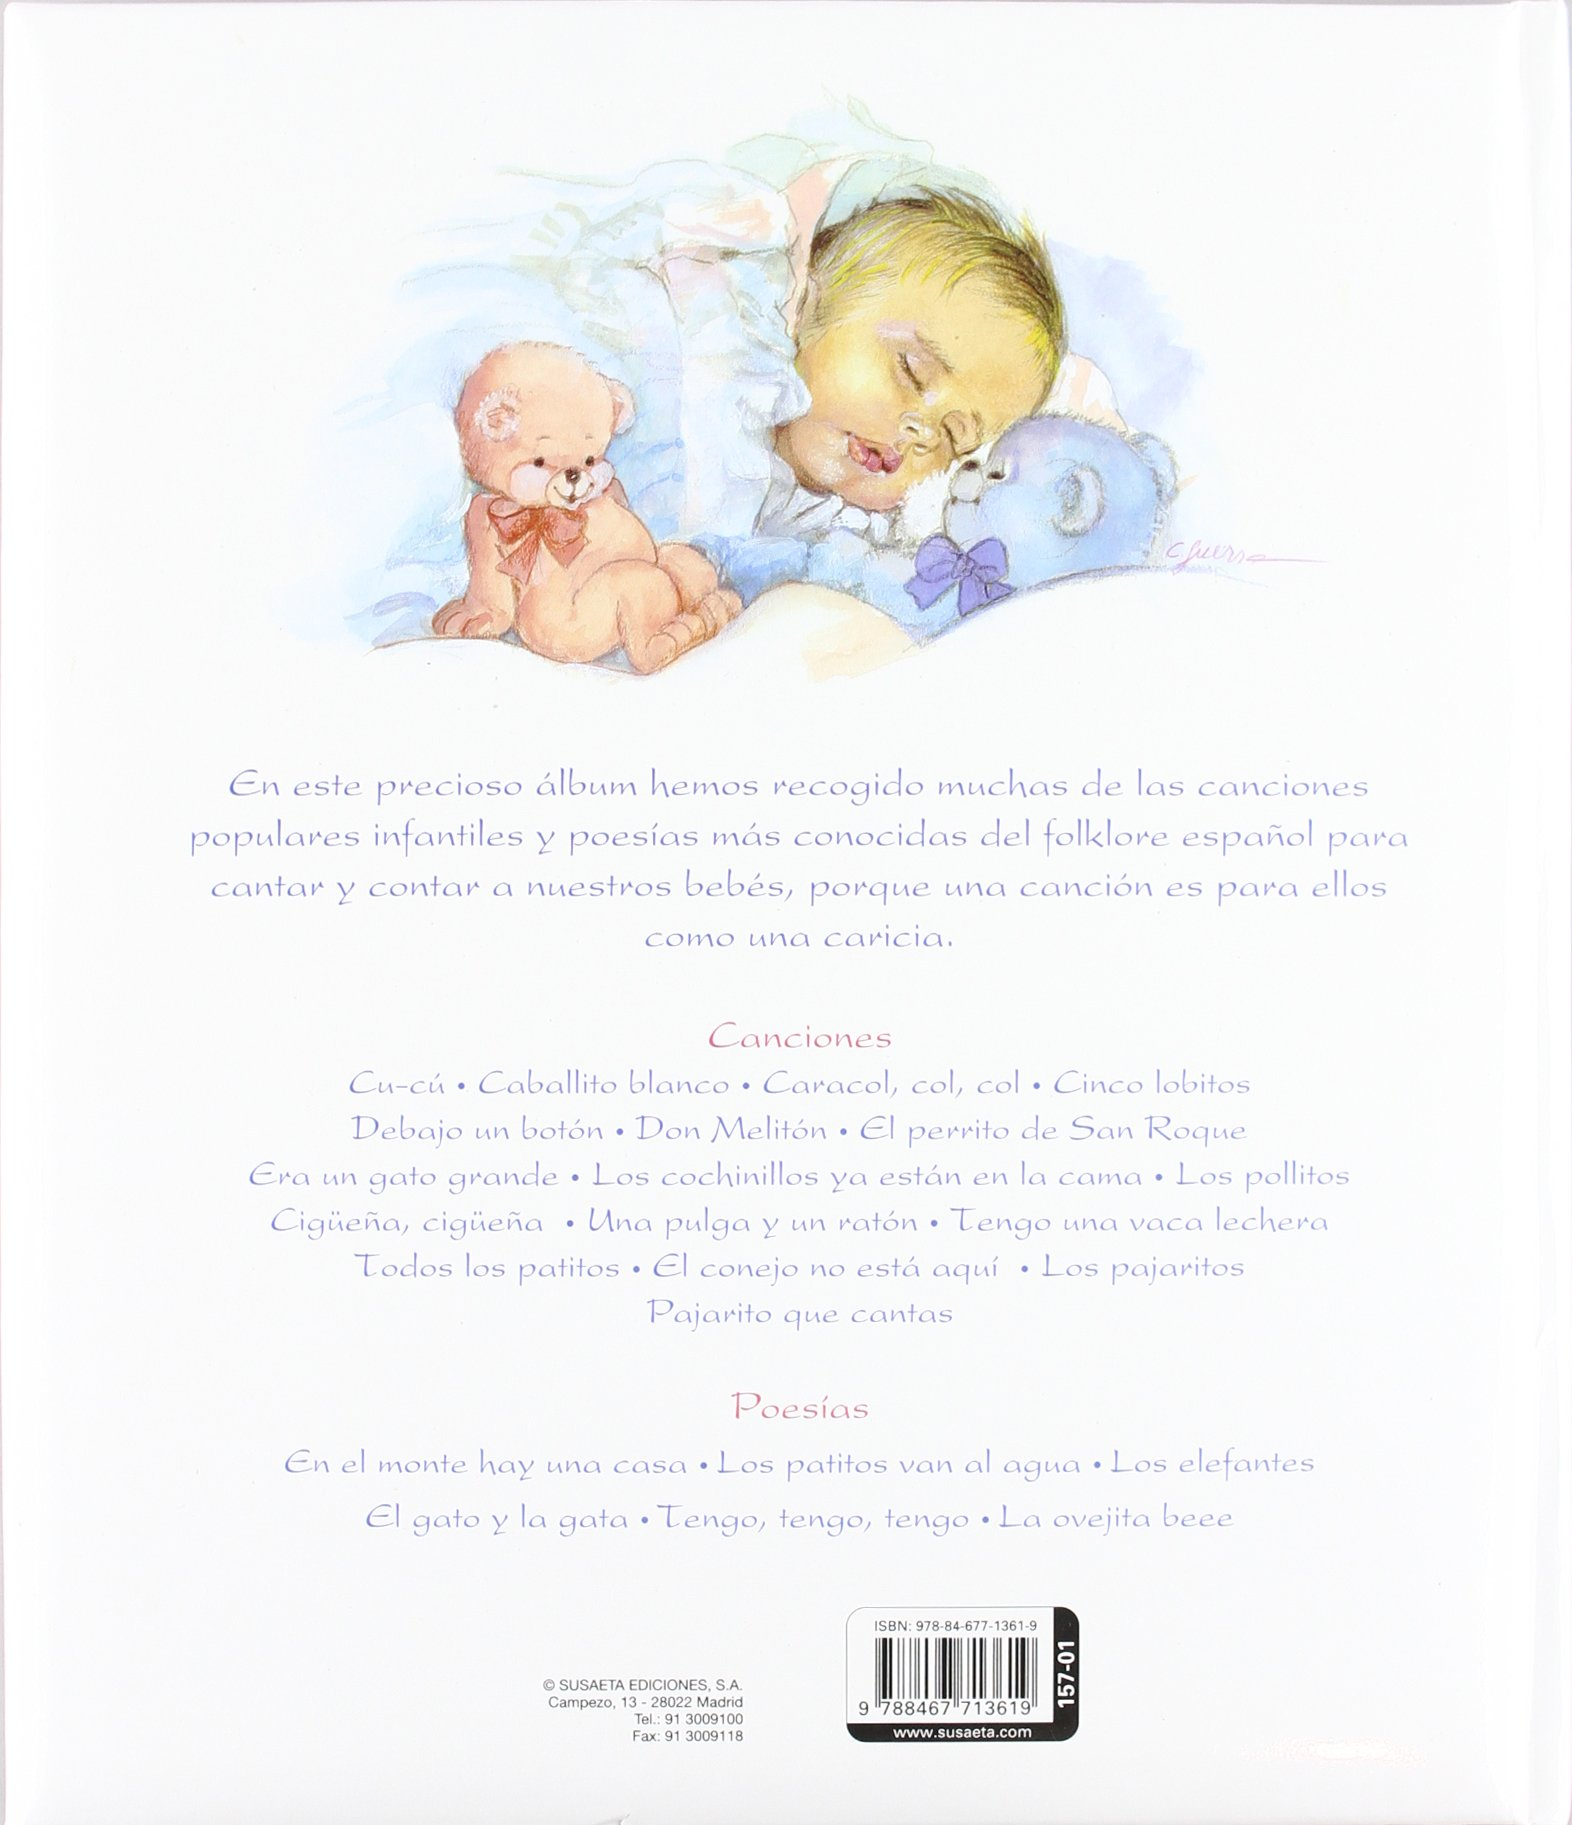 Amazon.com: Canciones para mi bebe / Songs for my baby (Spanish Edition) (9788467713619): Agapea: Books